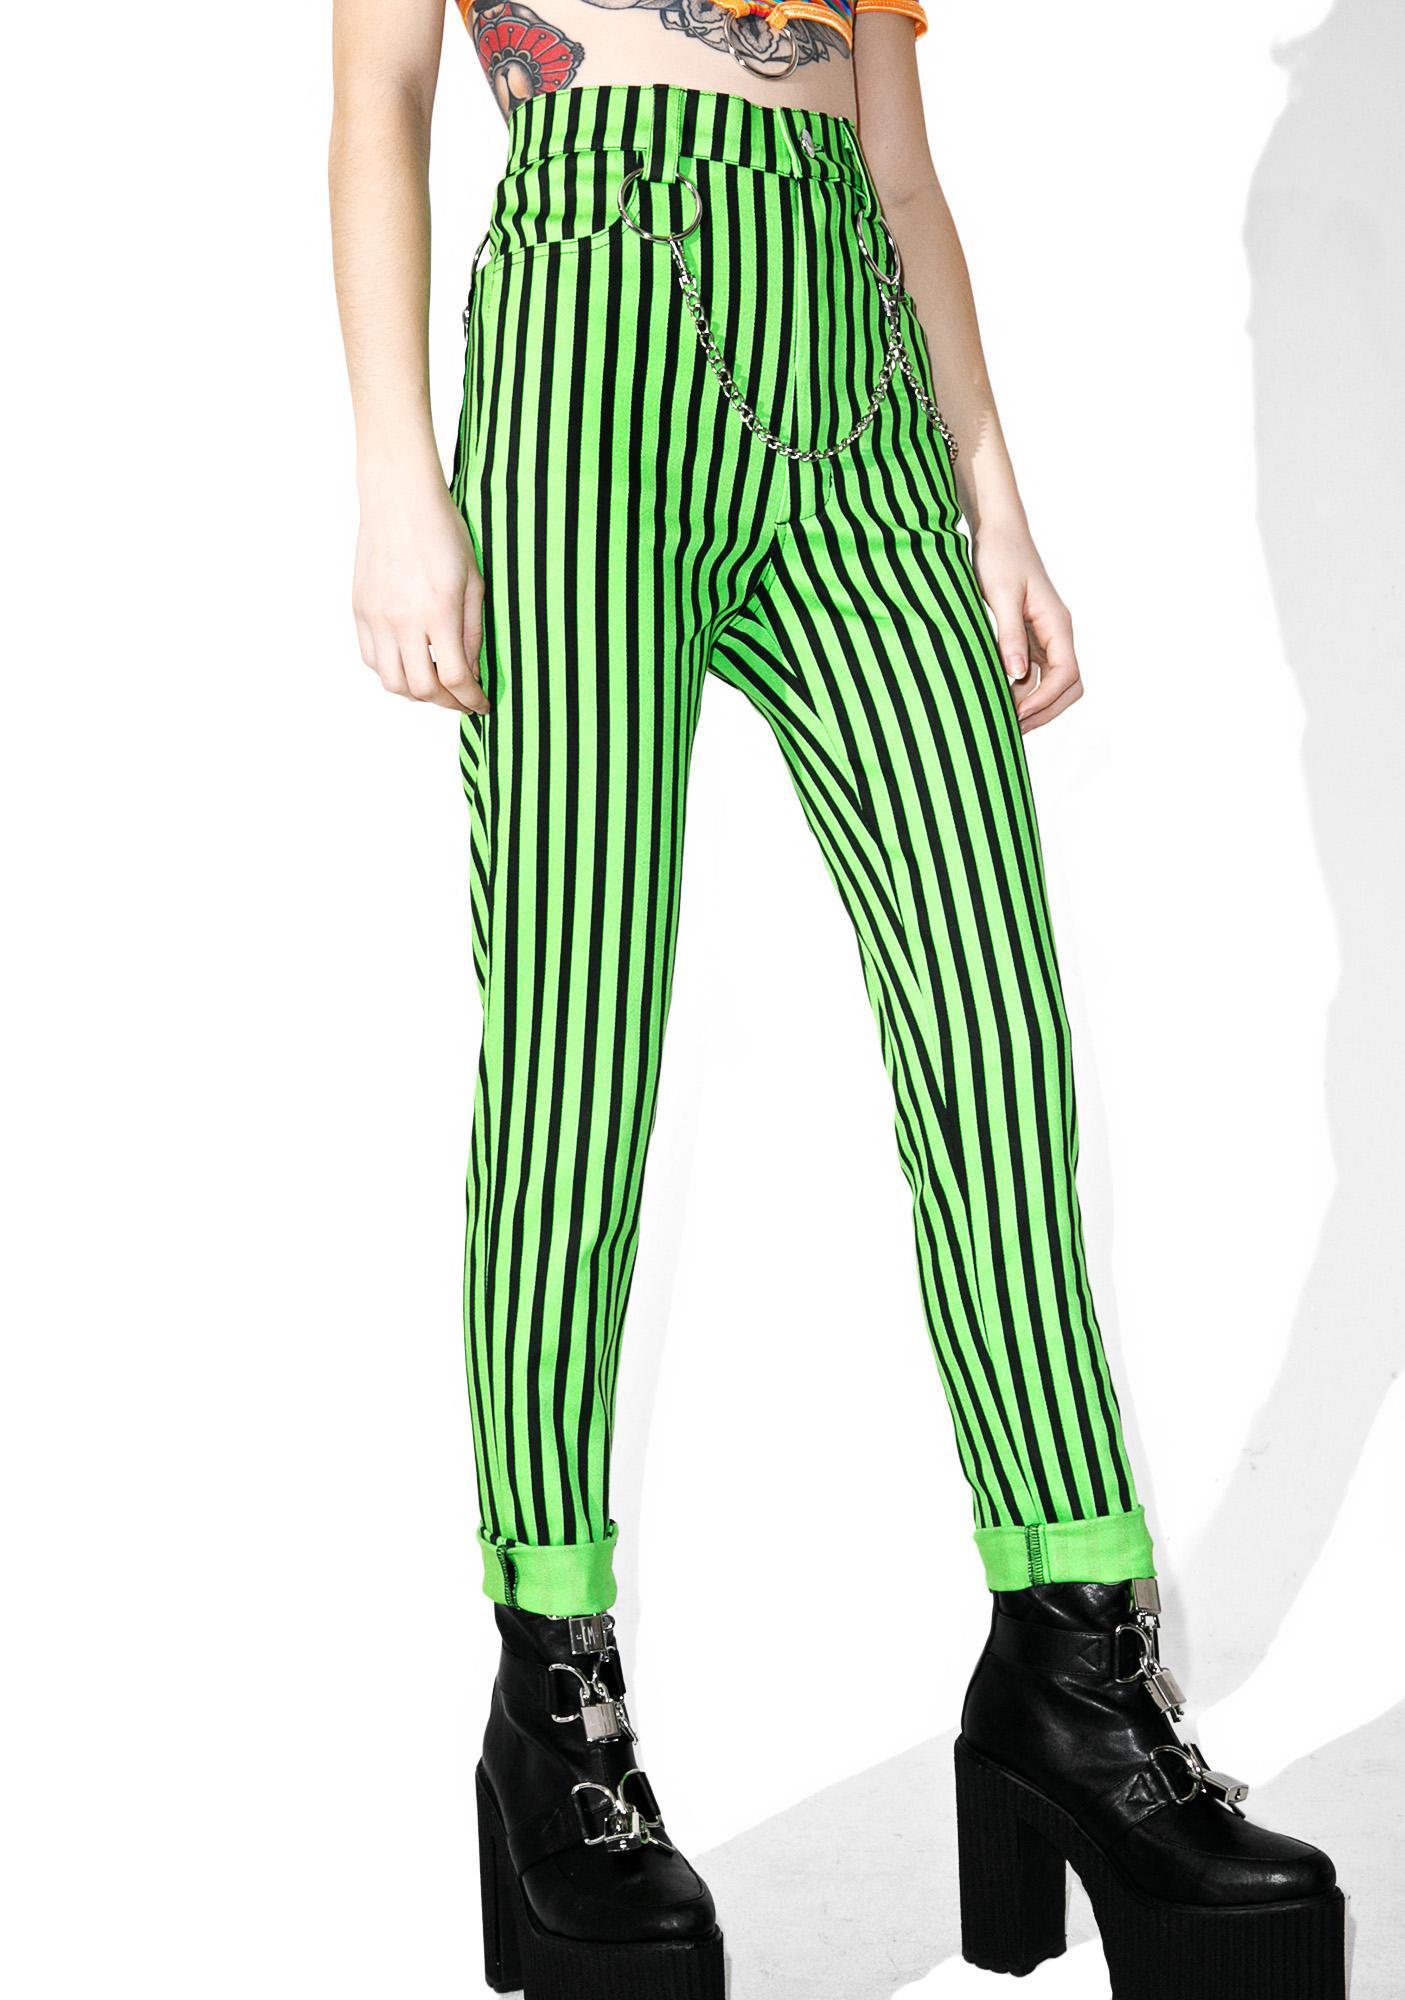 Indyanna Beetlejuice Pants